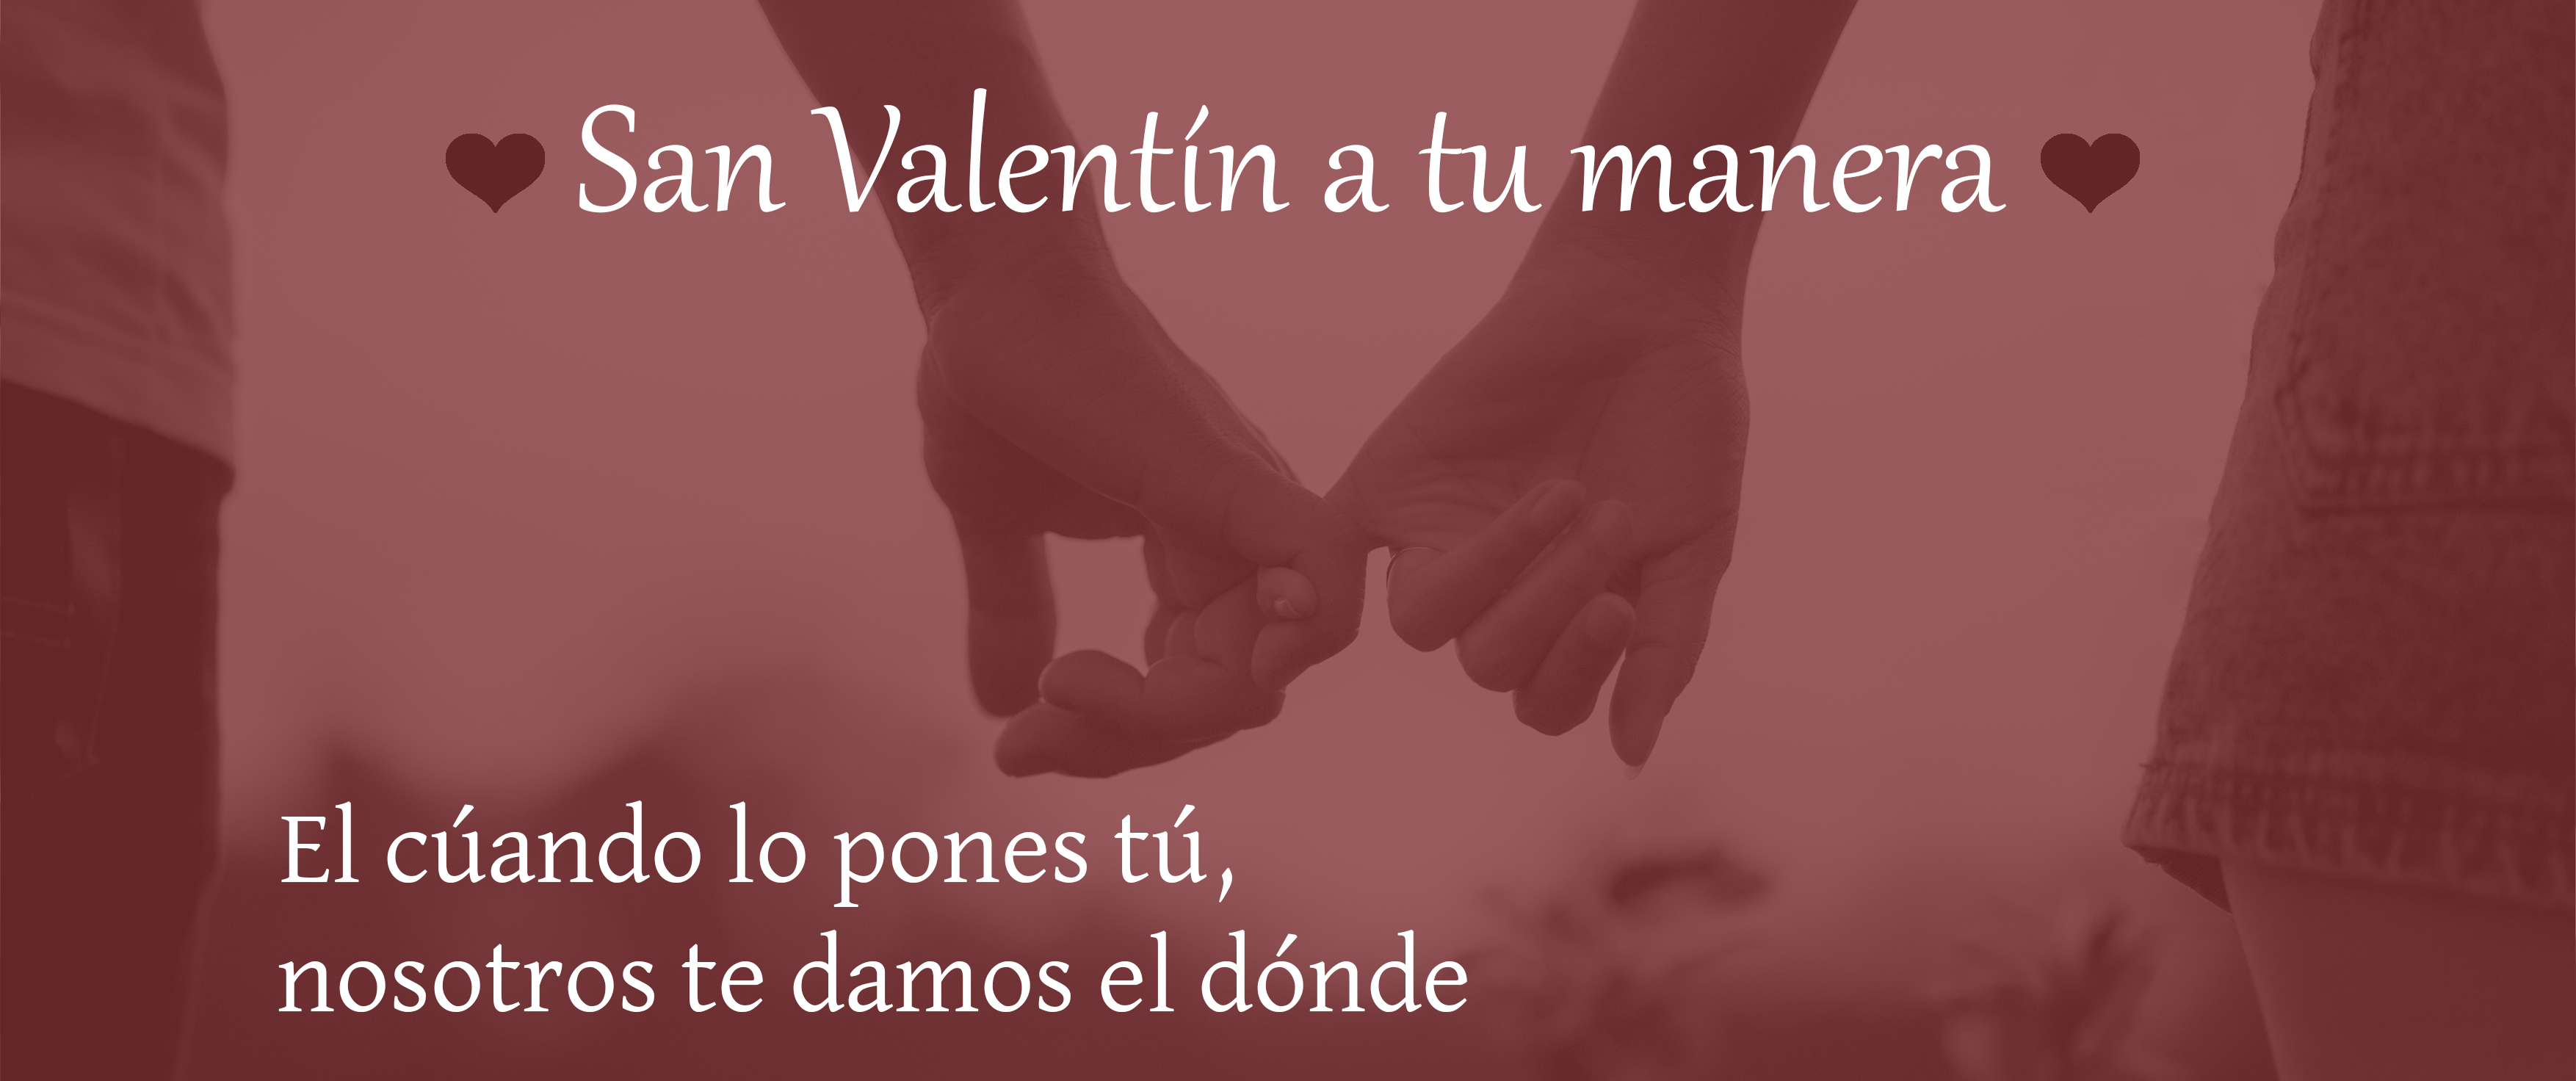 Escapadas románticas en San Valentín. ¿Dónde ir?